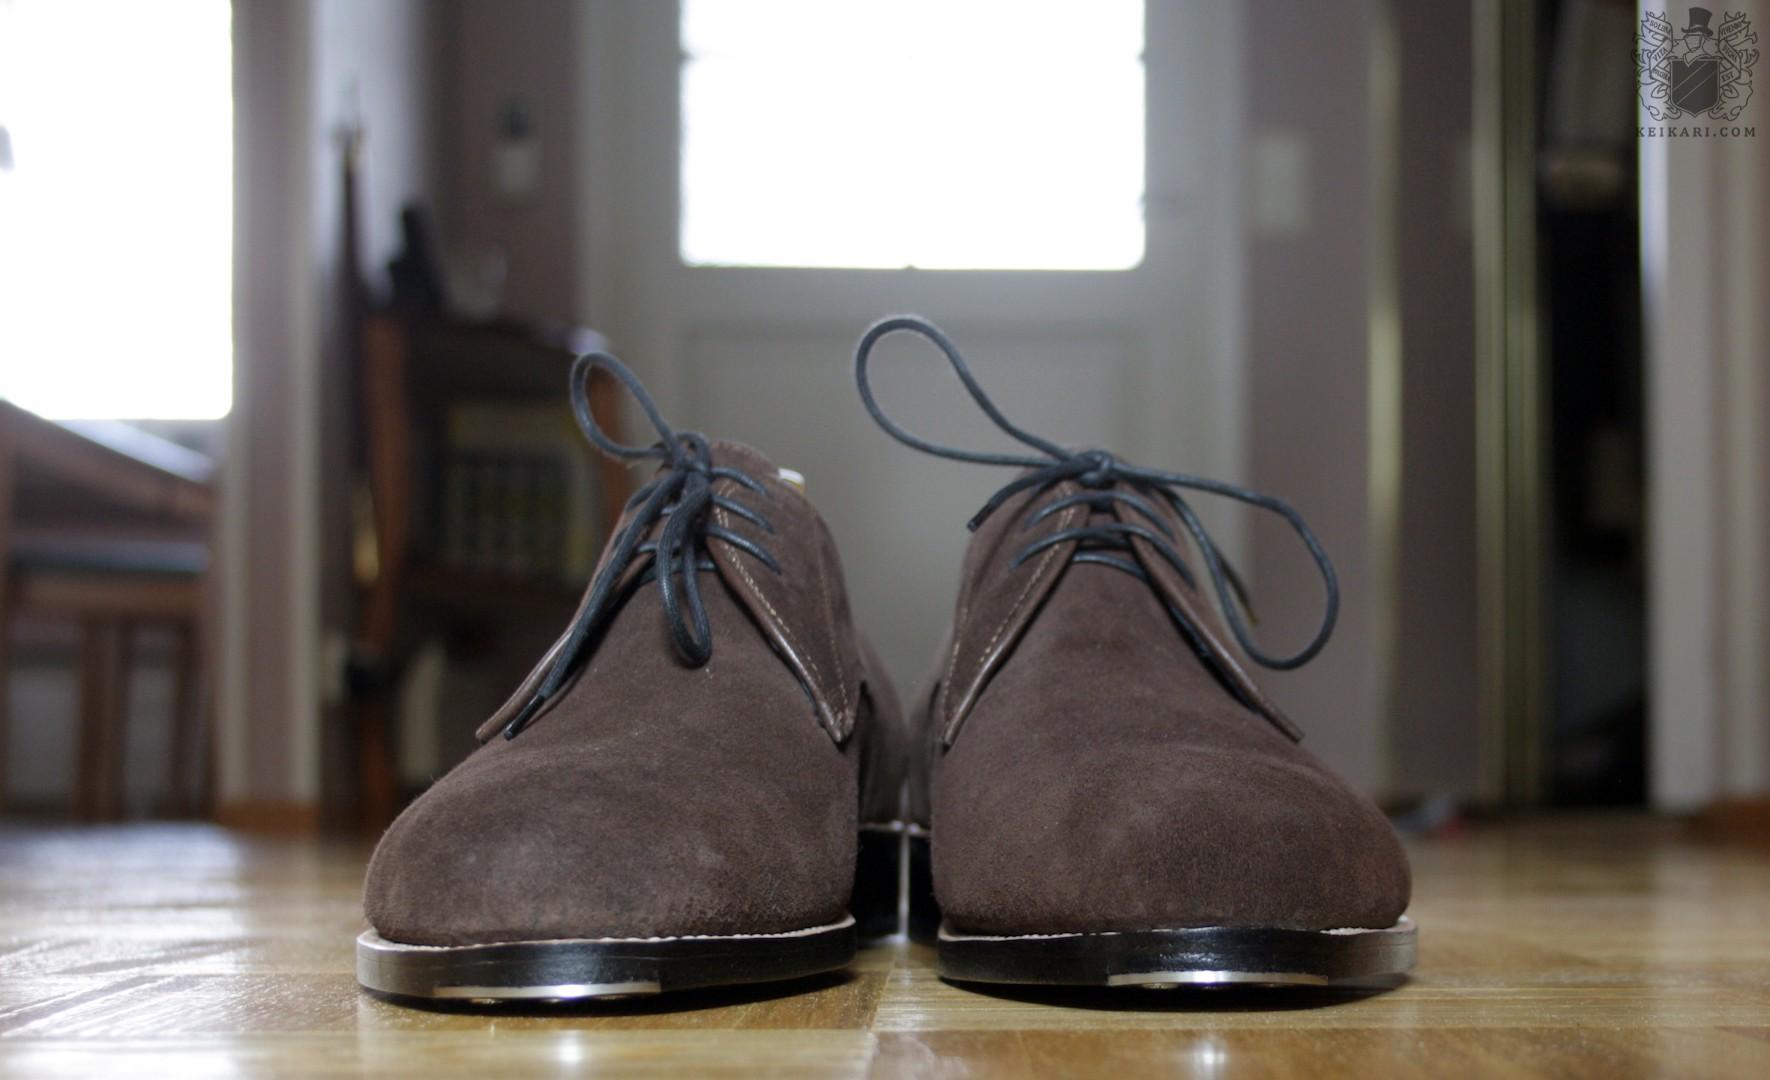 Anatomy_of_Buday_shoes_at_Keikari_dot_com04.jpg